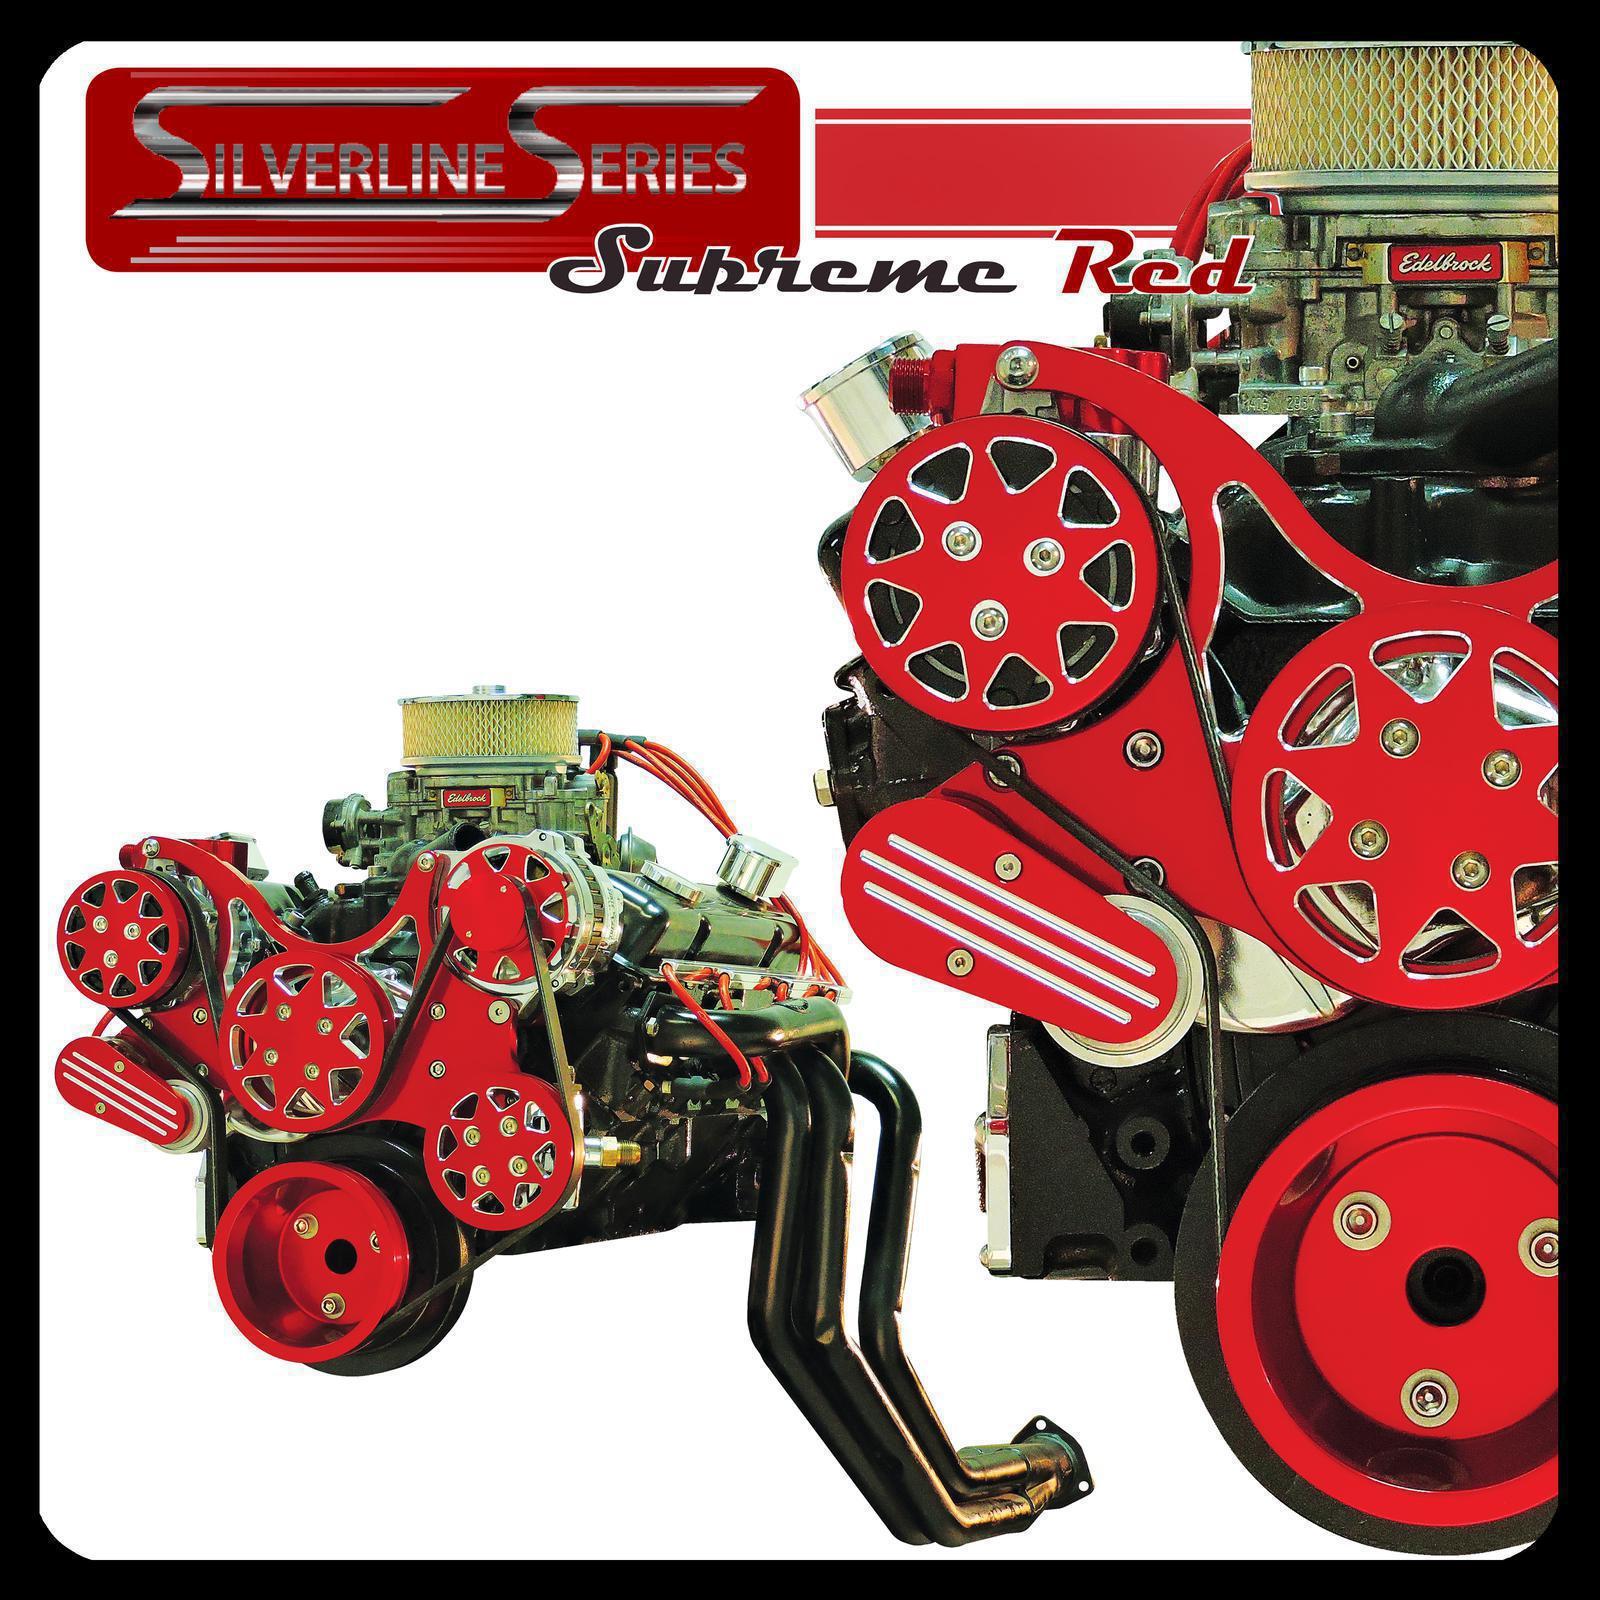 Catalog Cover - Supreme Red